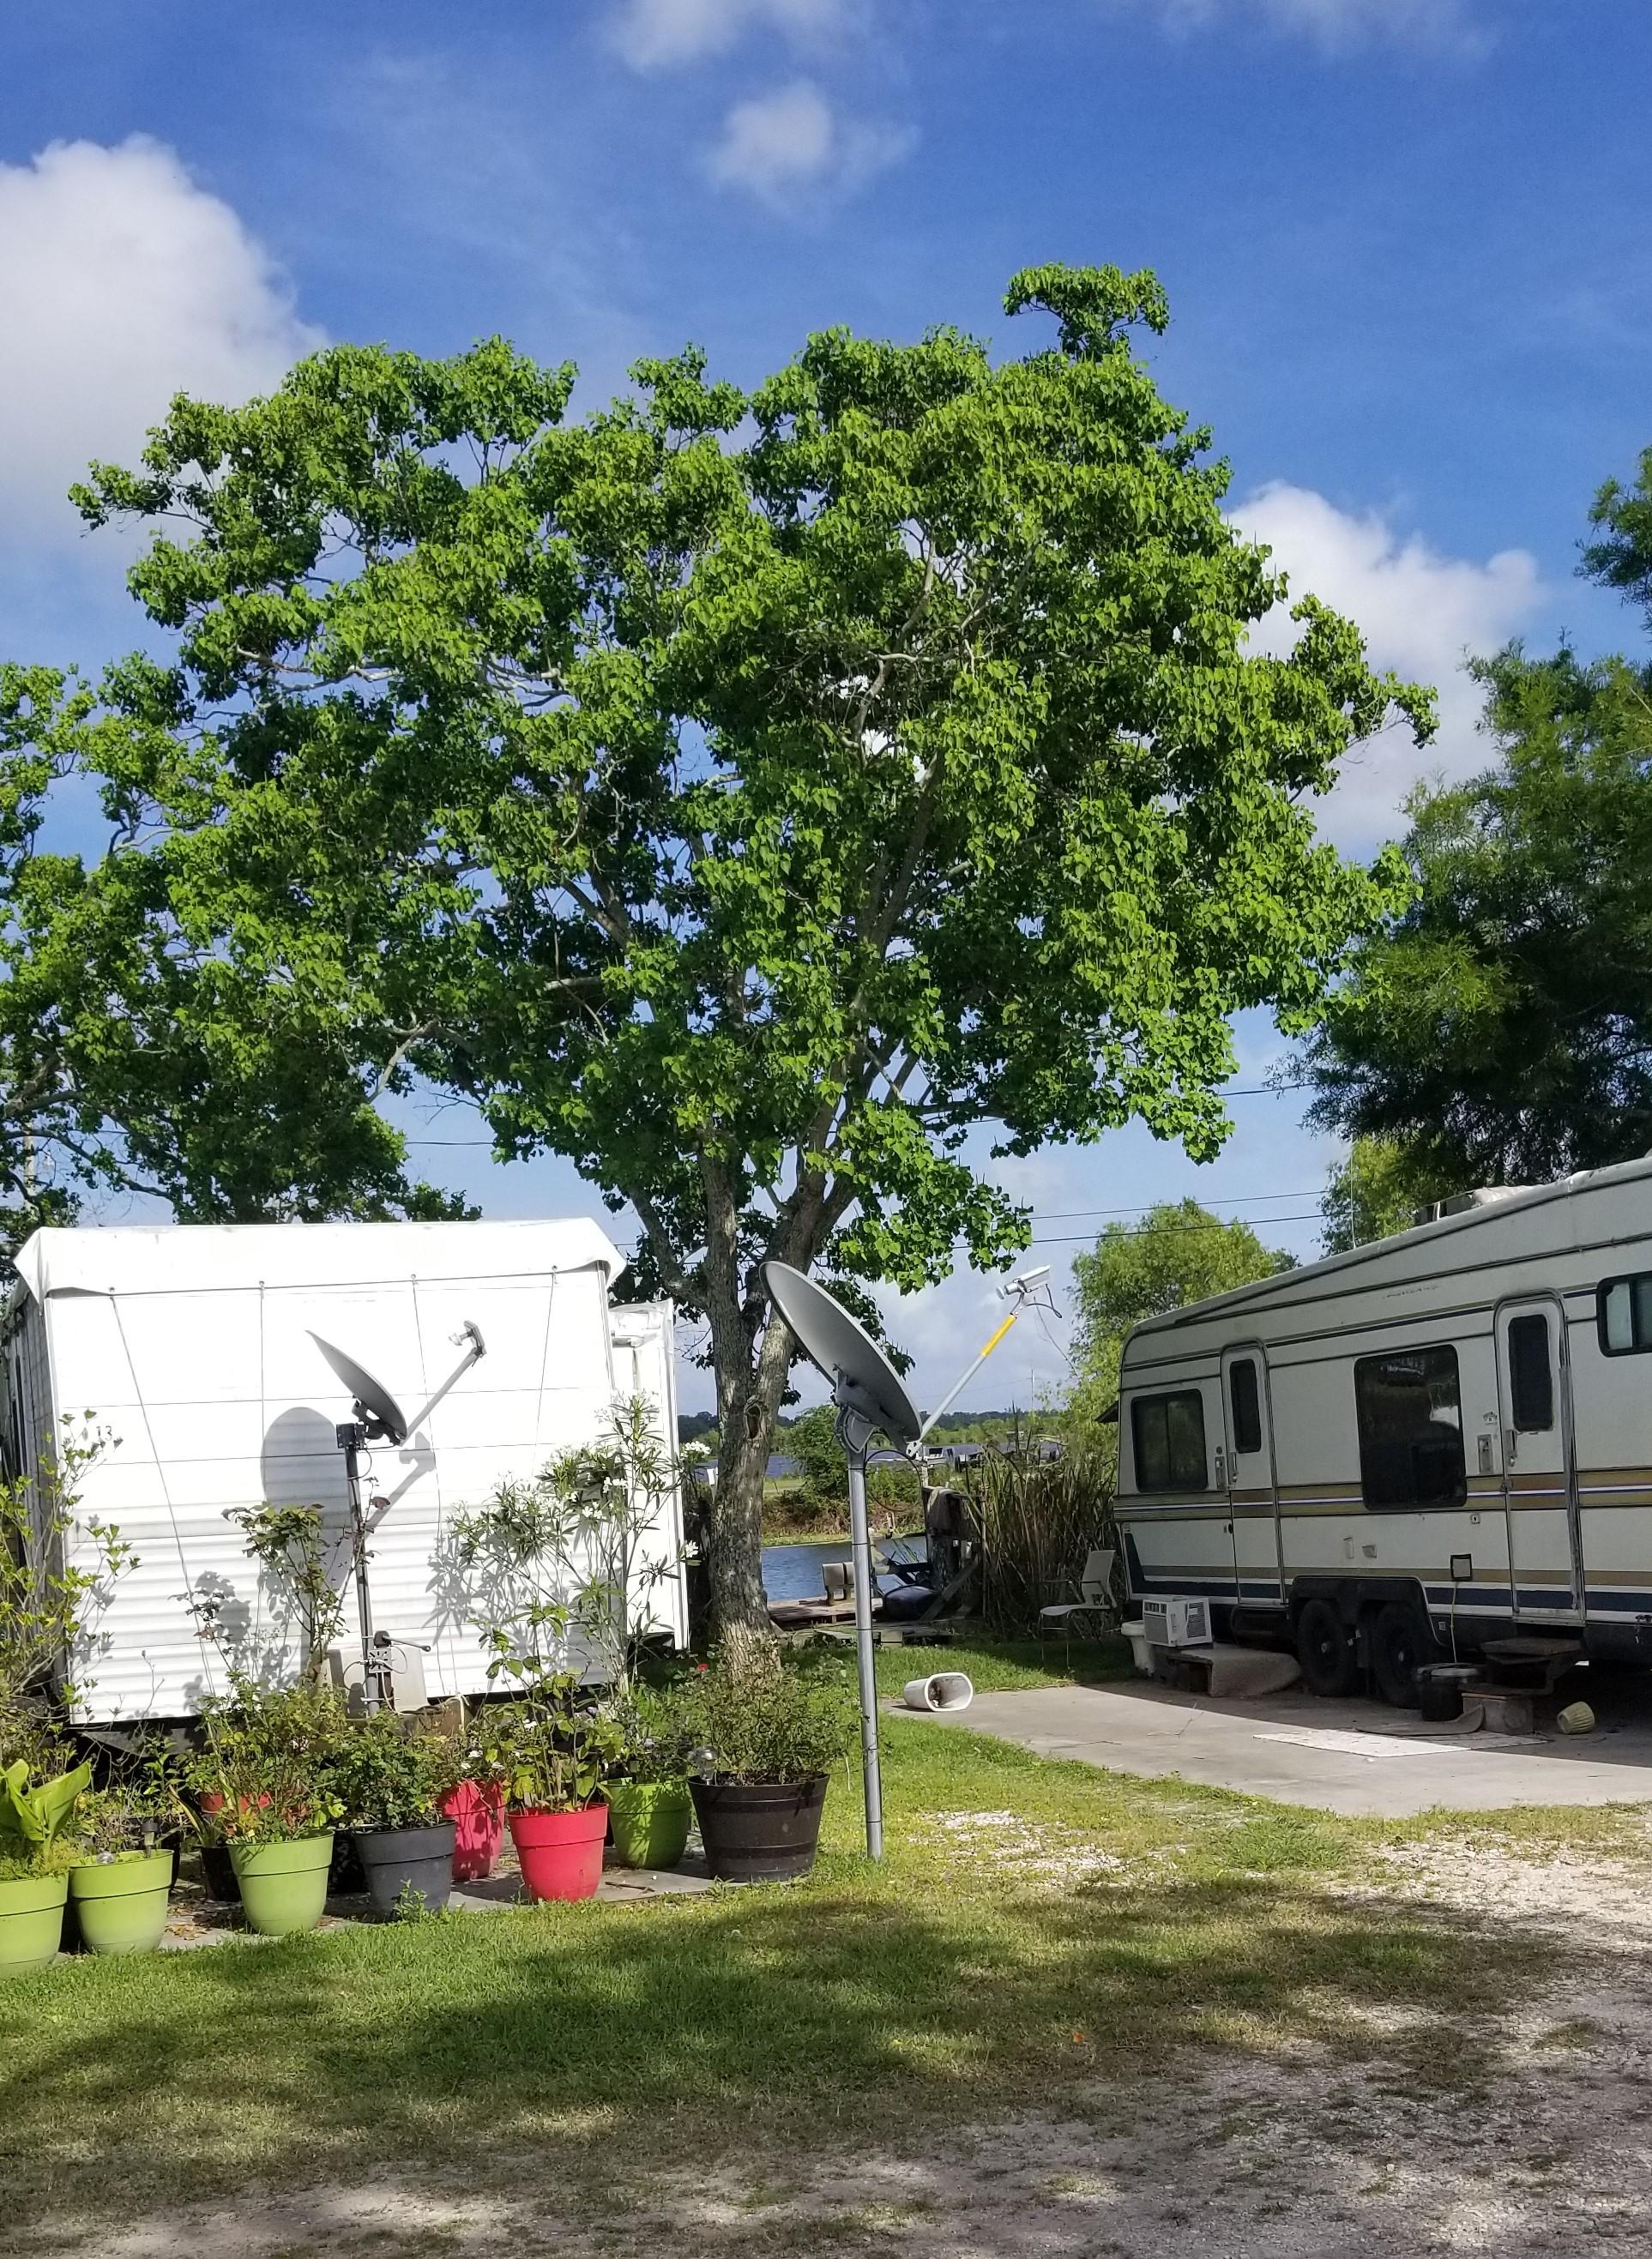 Vanacor's RV Park and Campground